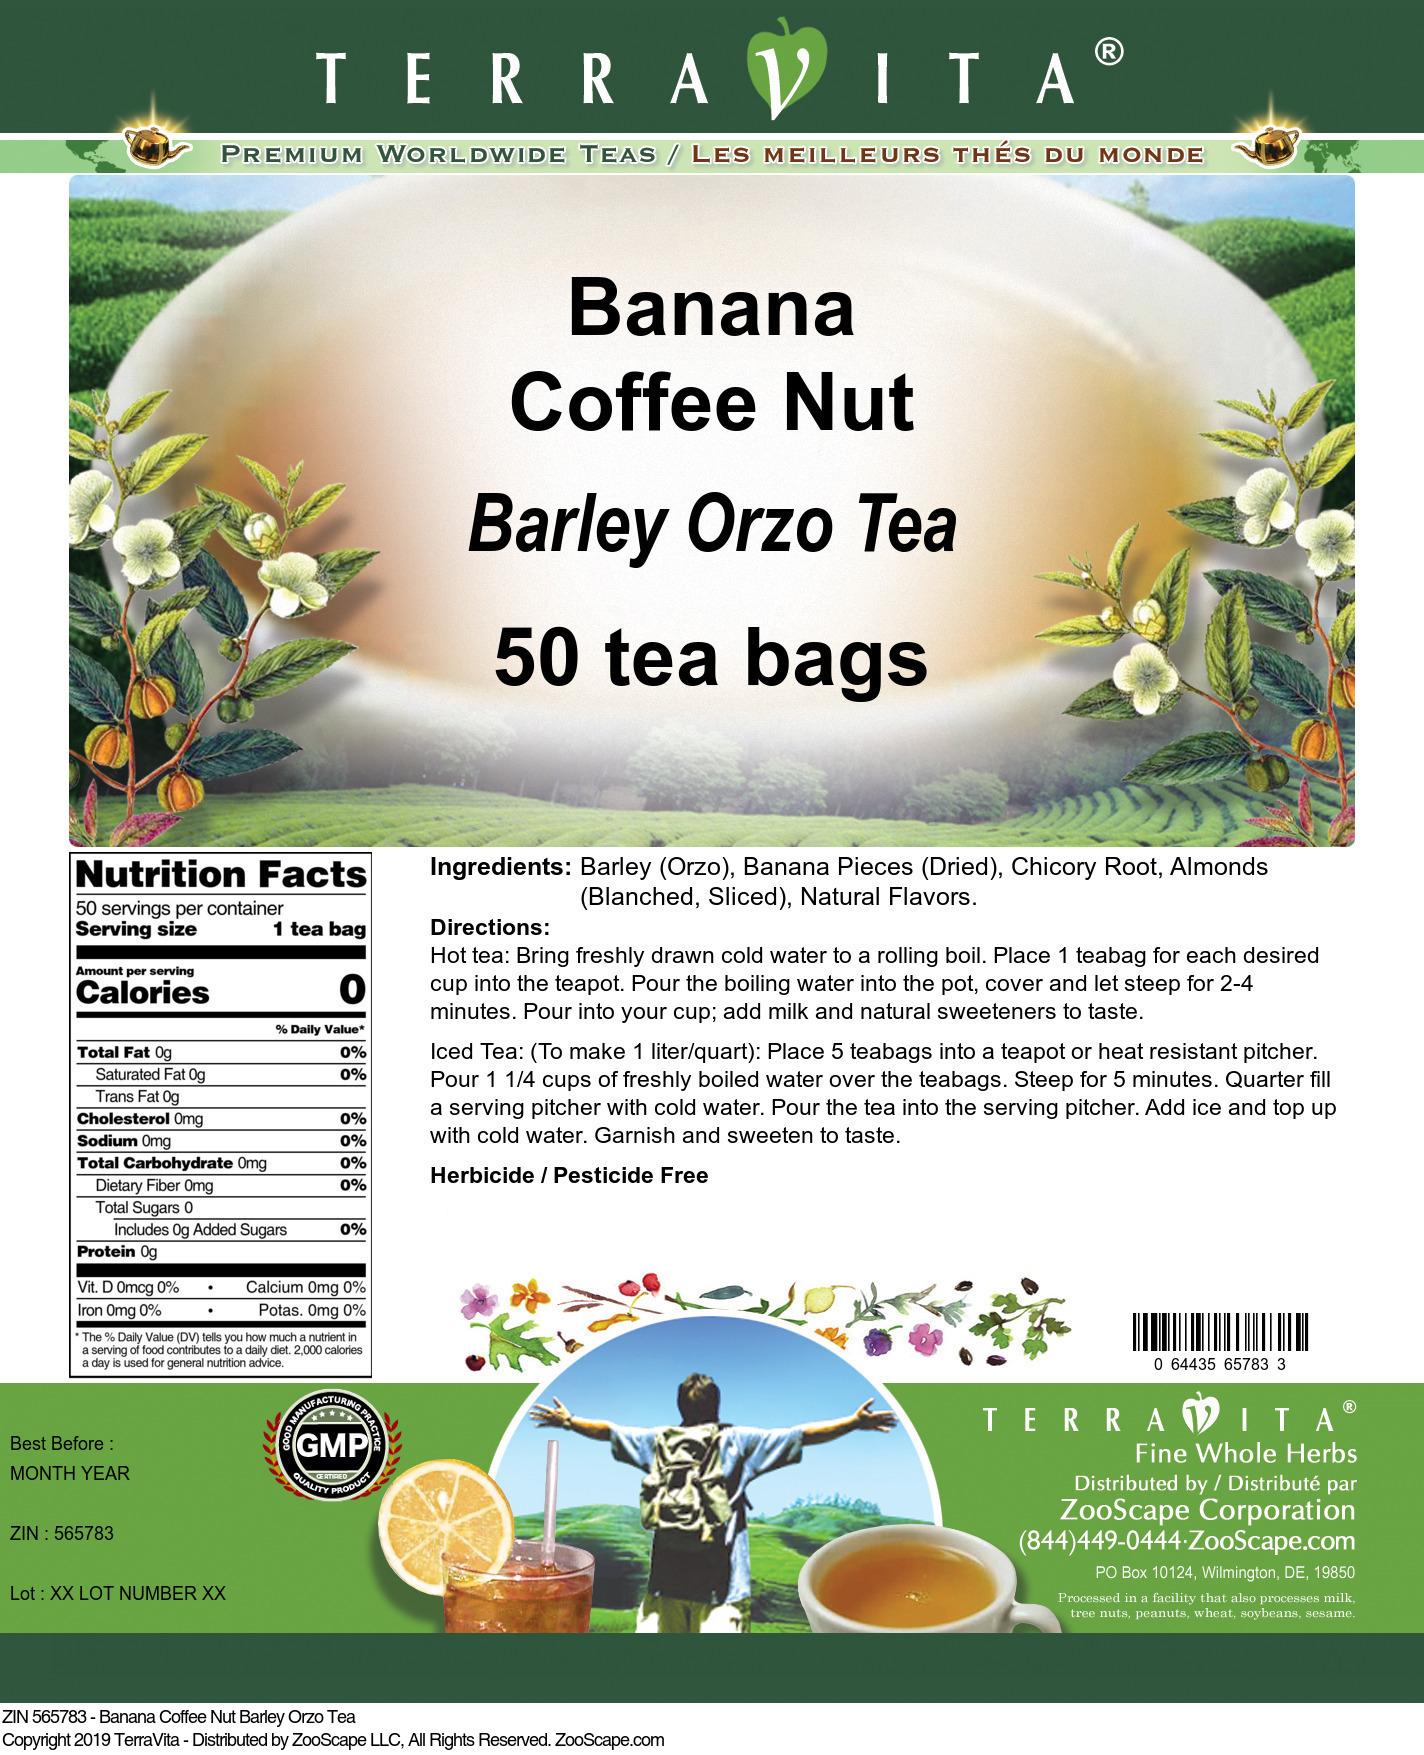 Banana Coffee Nut Barley Orzo